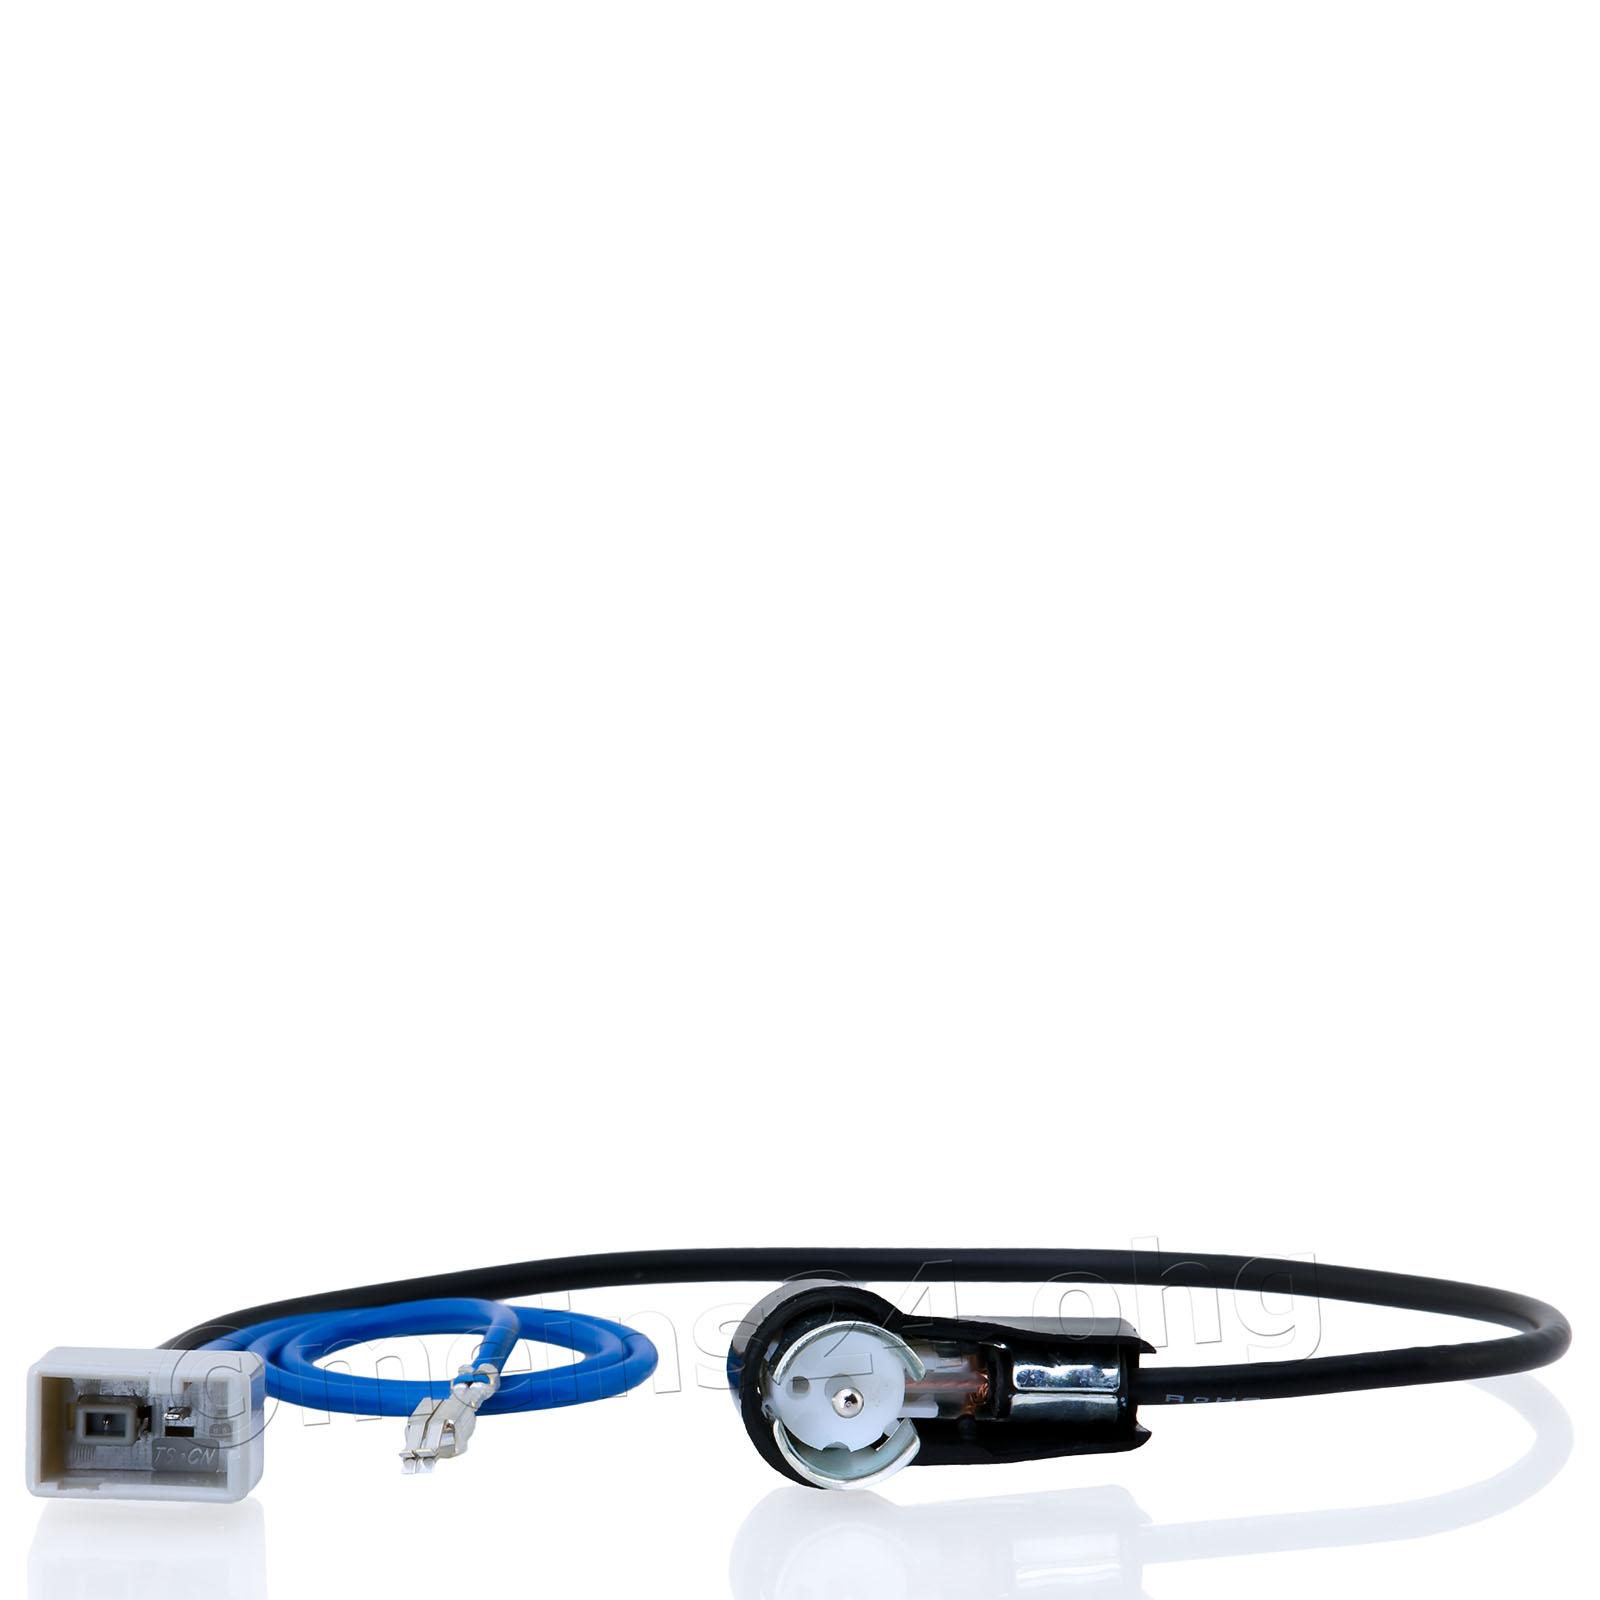 Antennenadapter HONDA MAZDA Stecker (m) -> ISO Stecker (m) 50 Ohm